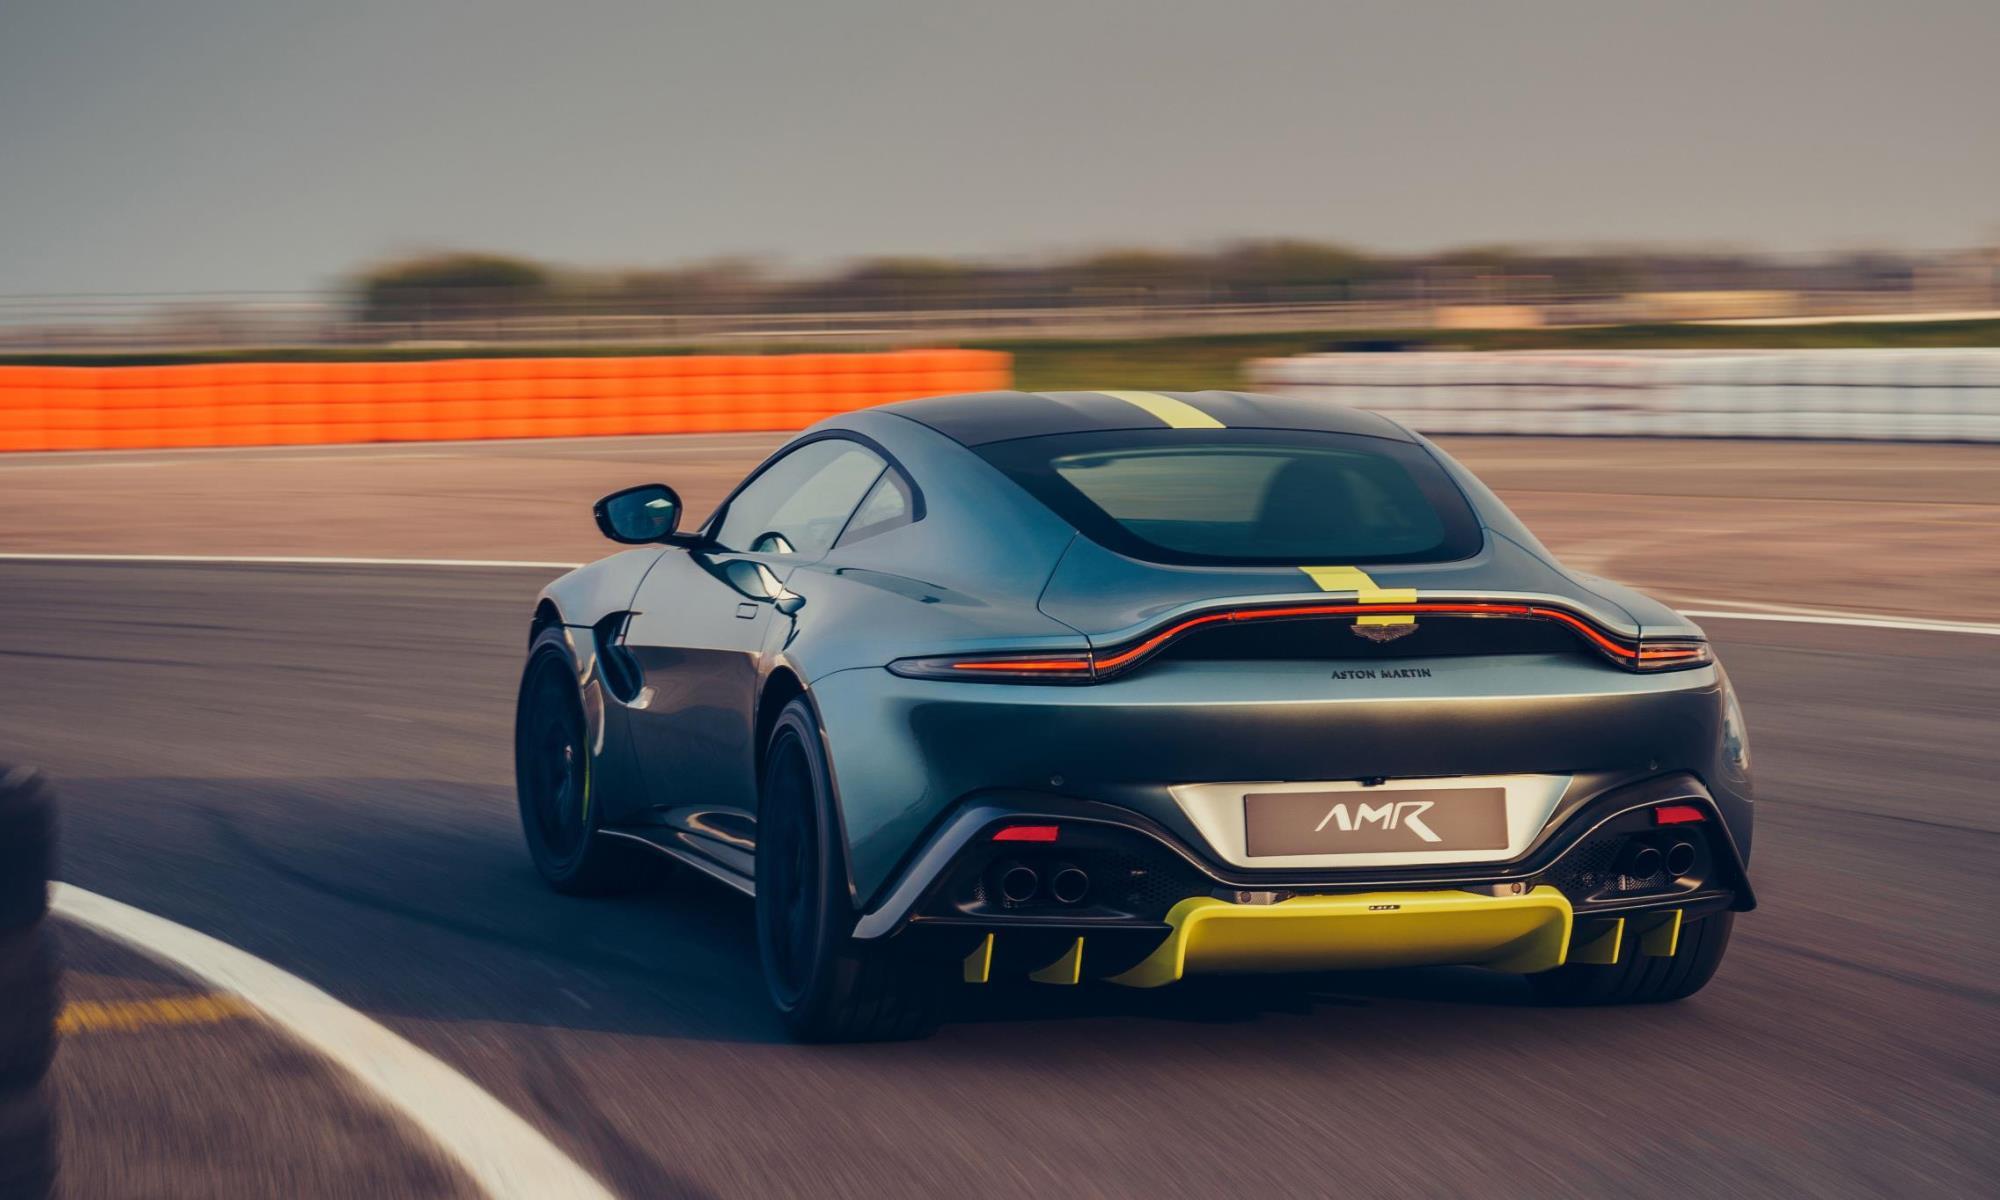 Aston Martin Vantage AMR profile